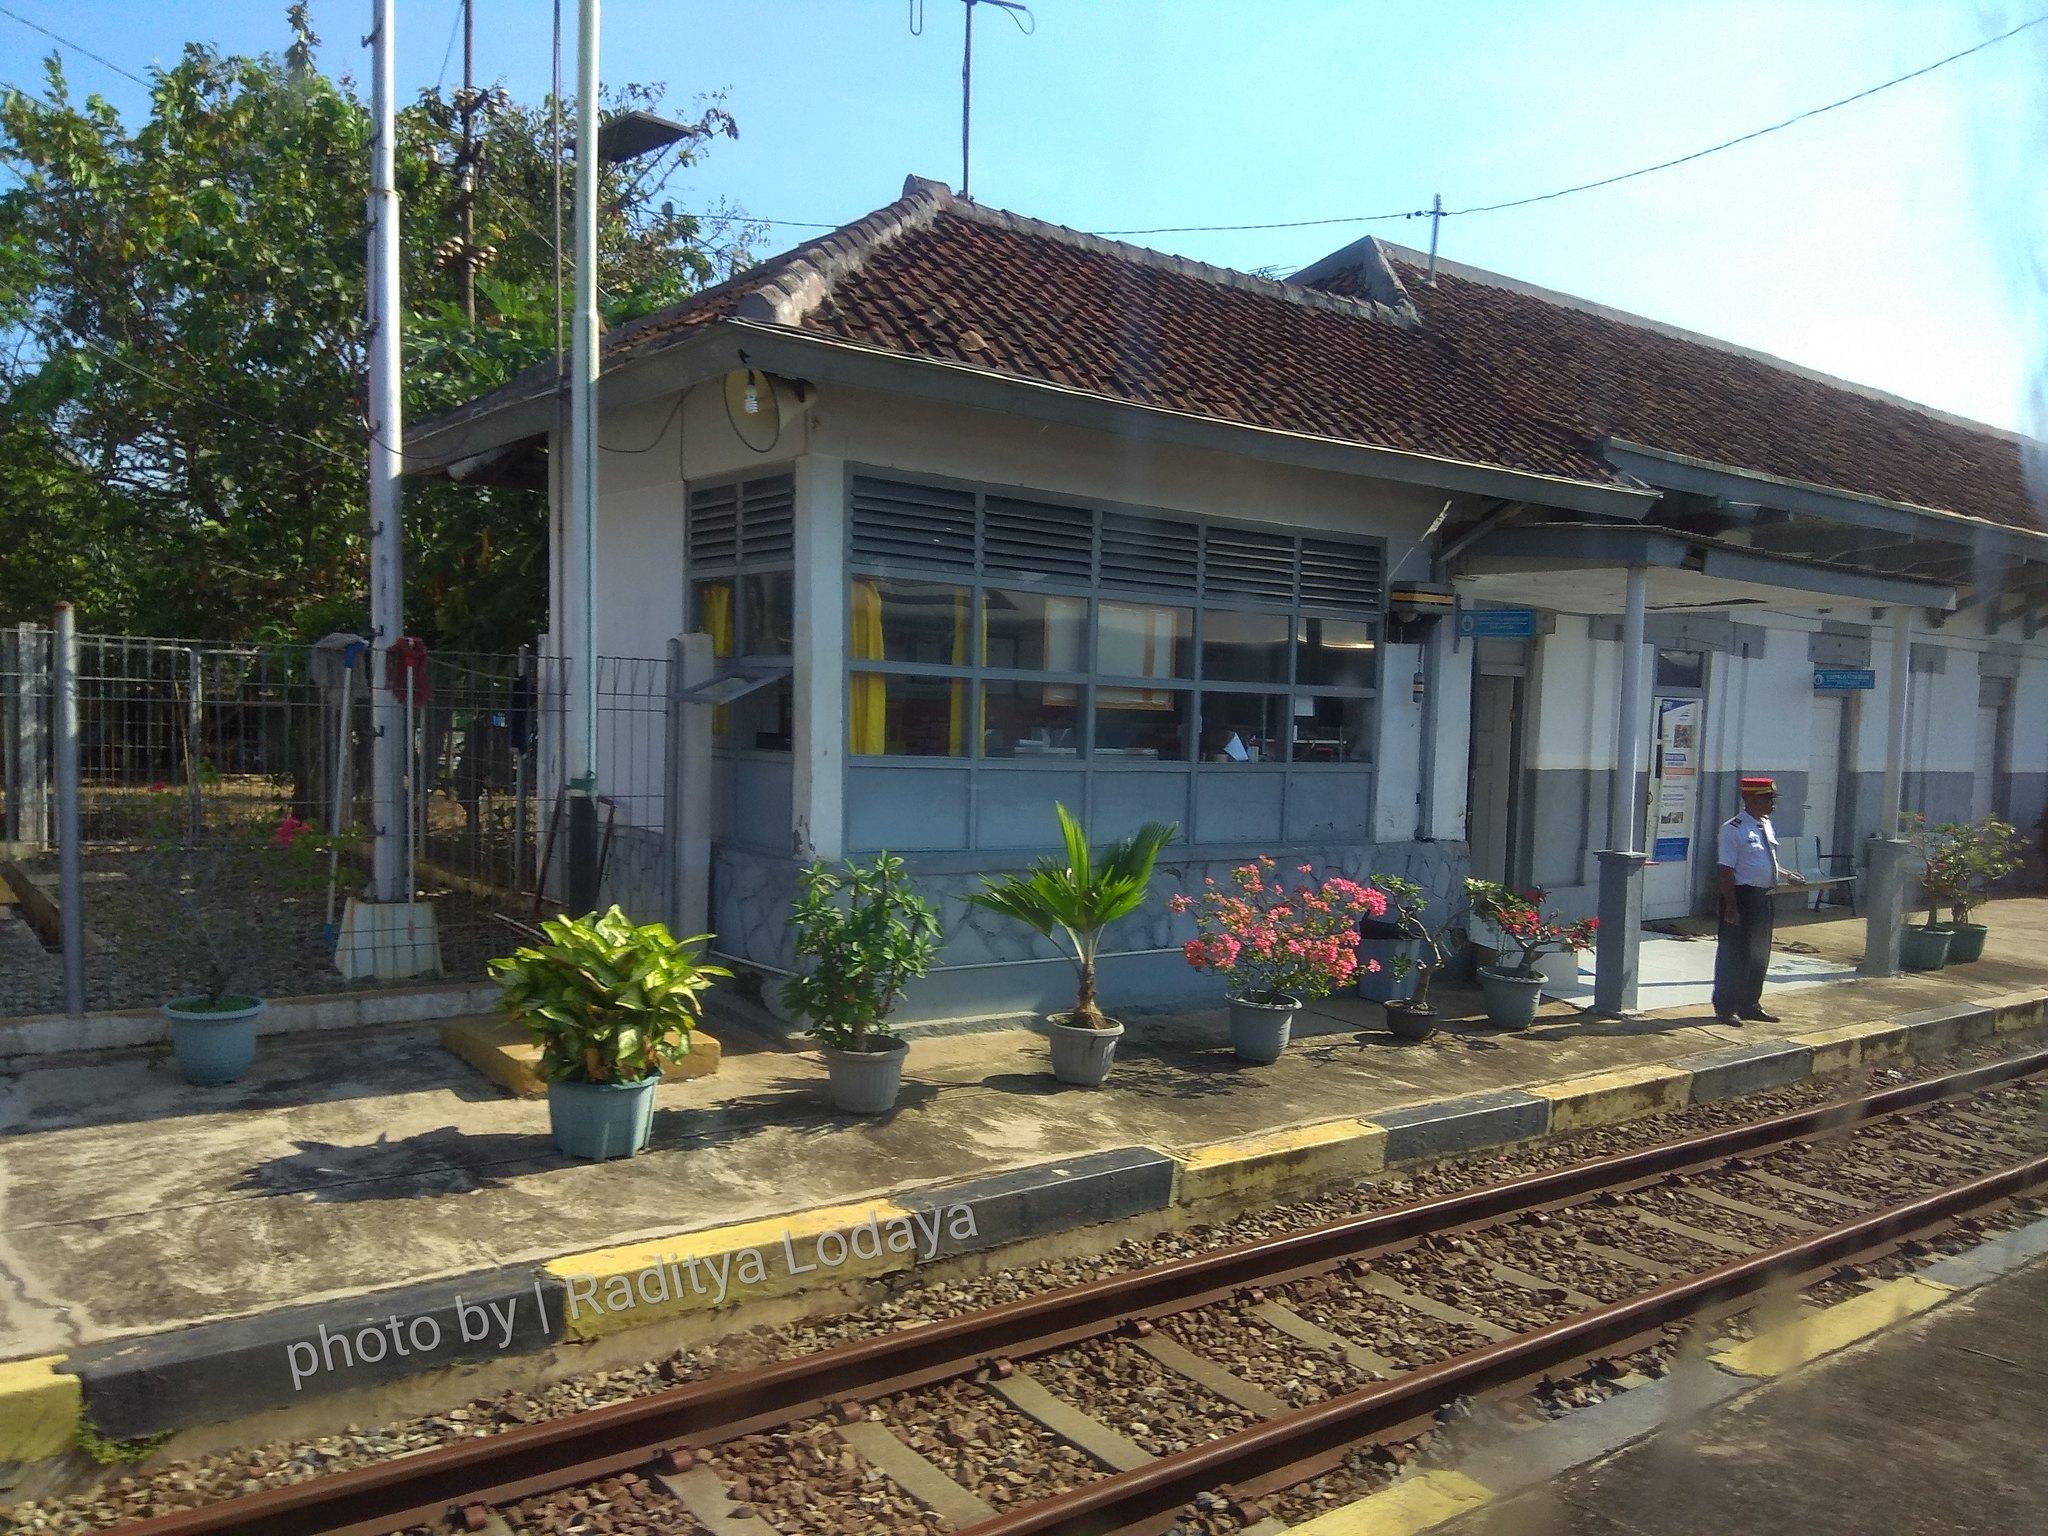 12 TRIP REPORT KERETA API JAYABAYA 1 (JAKARTA-CIREBON) -- STASIUN PASIRBUNGUR 1